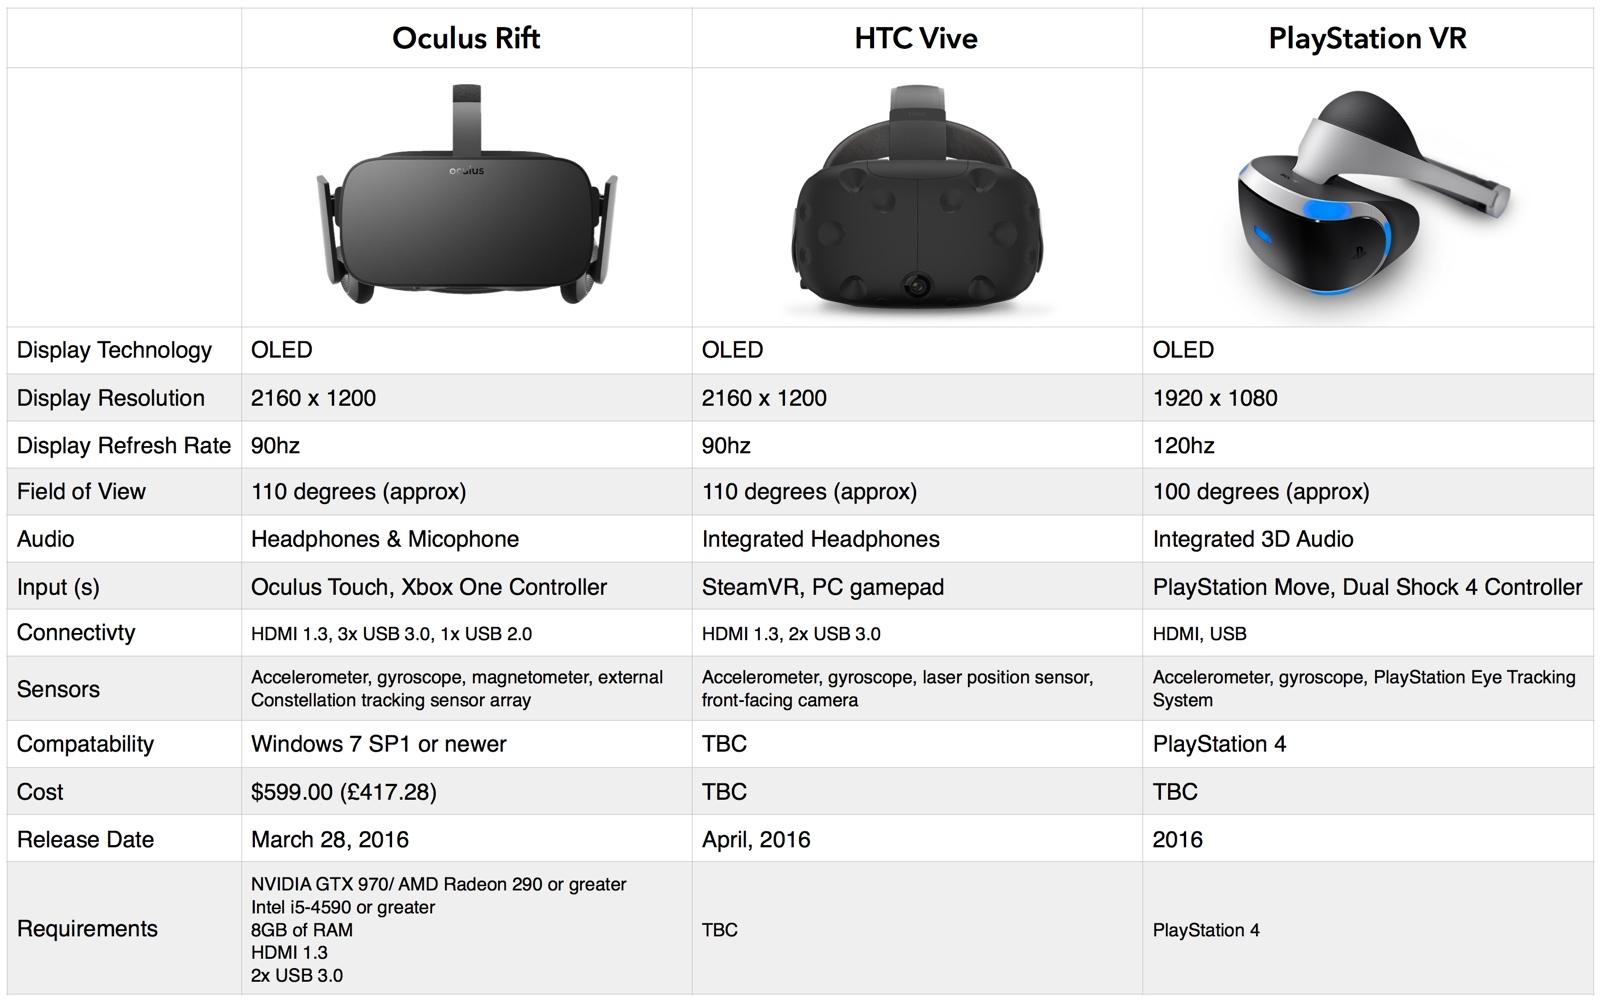 Htc Vive System Requirements >> Vr Roundup Rift Vs Vive Vs Playstation Vr